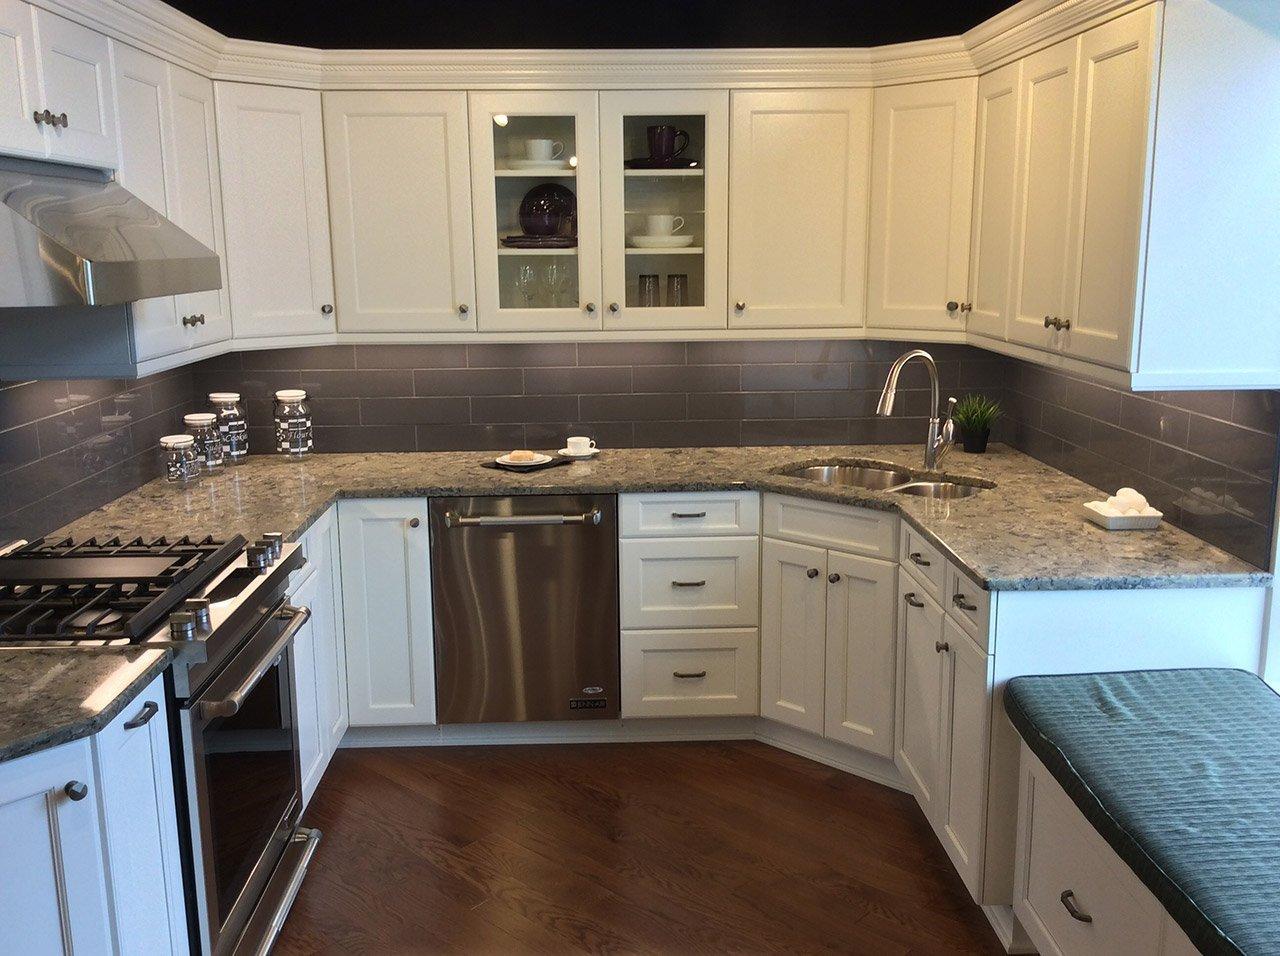 kitchen and bath design center faucet sprayer patete photo gallery